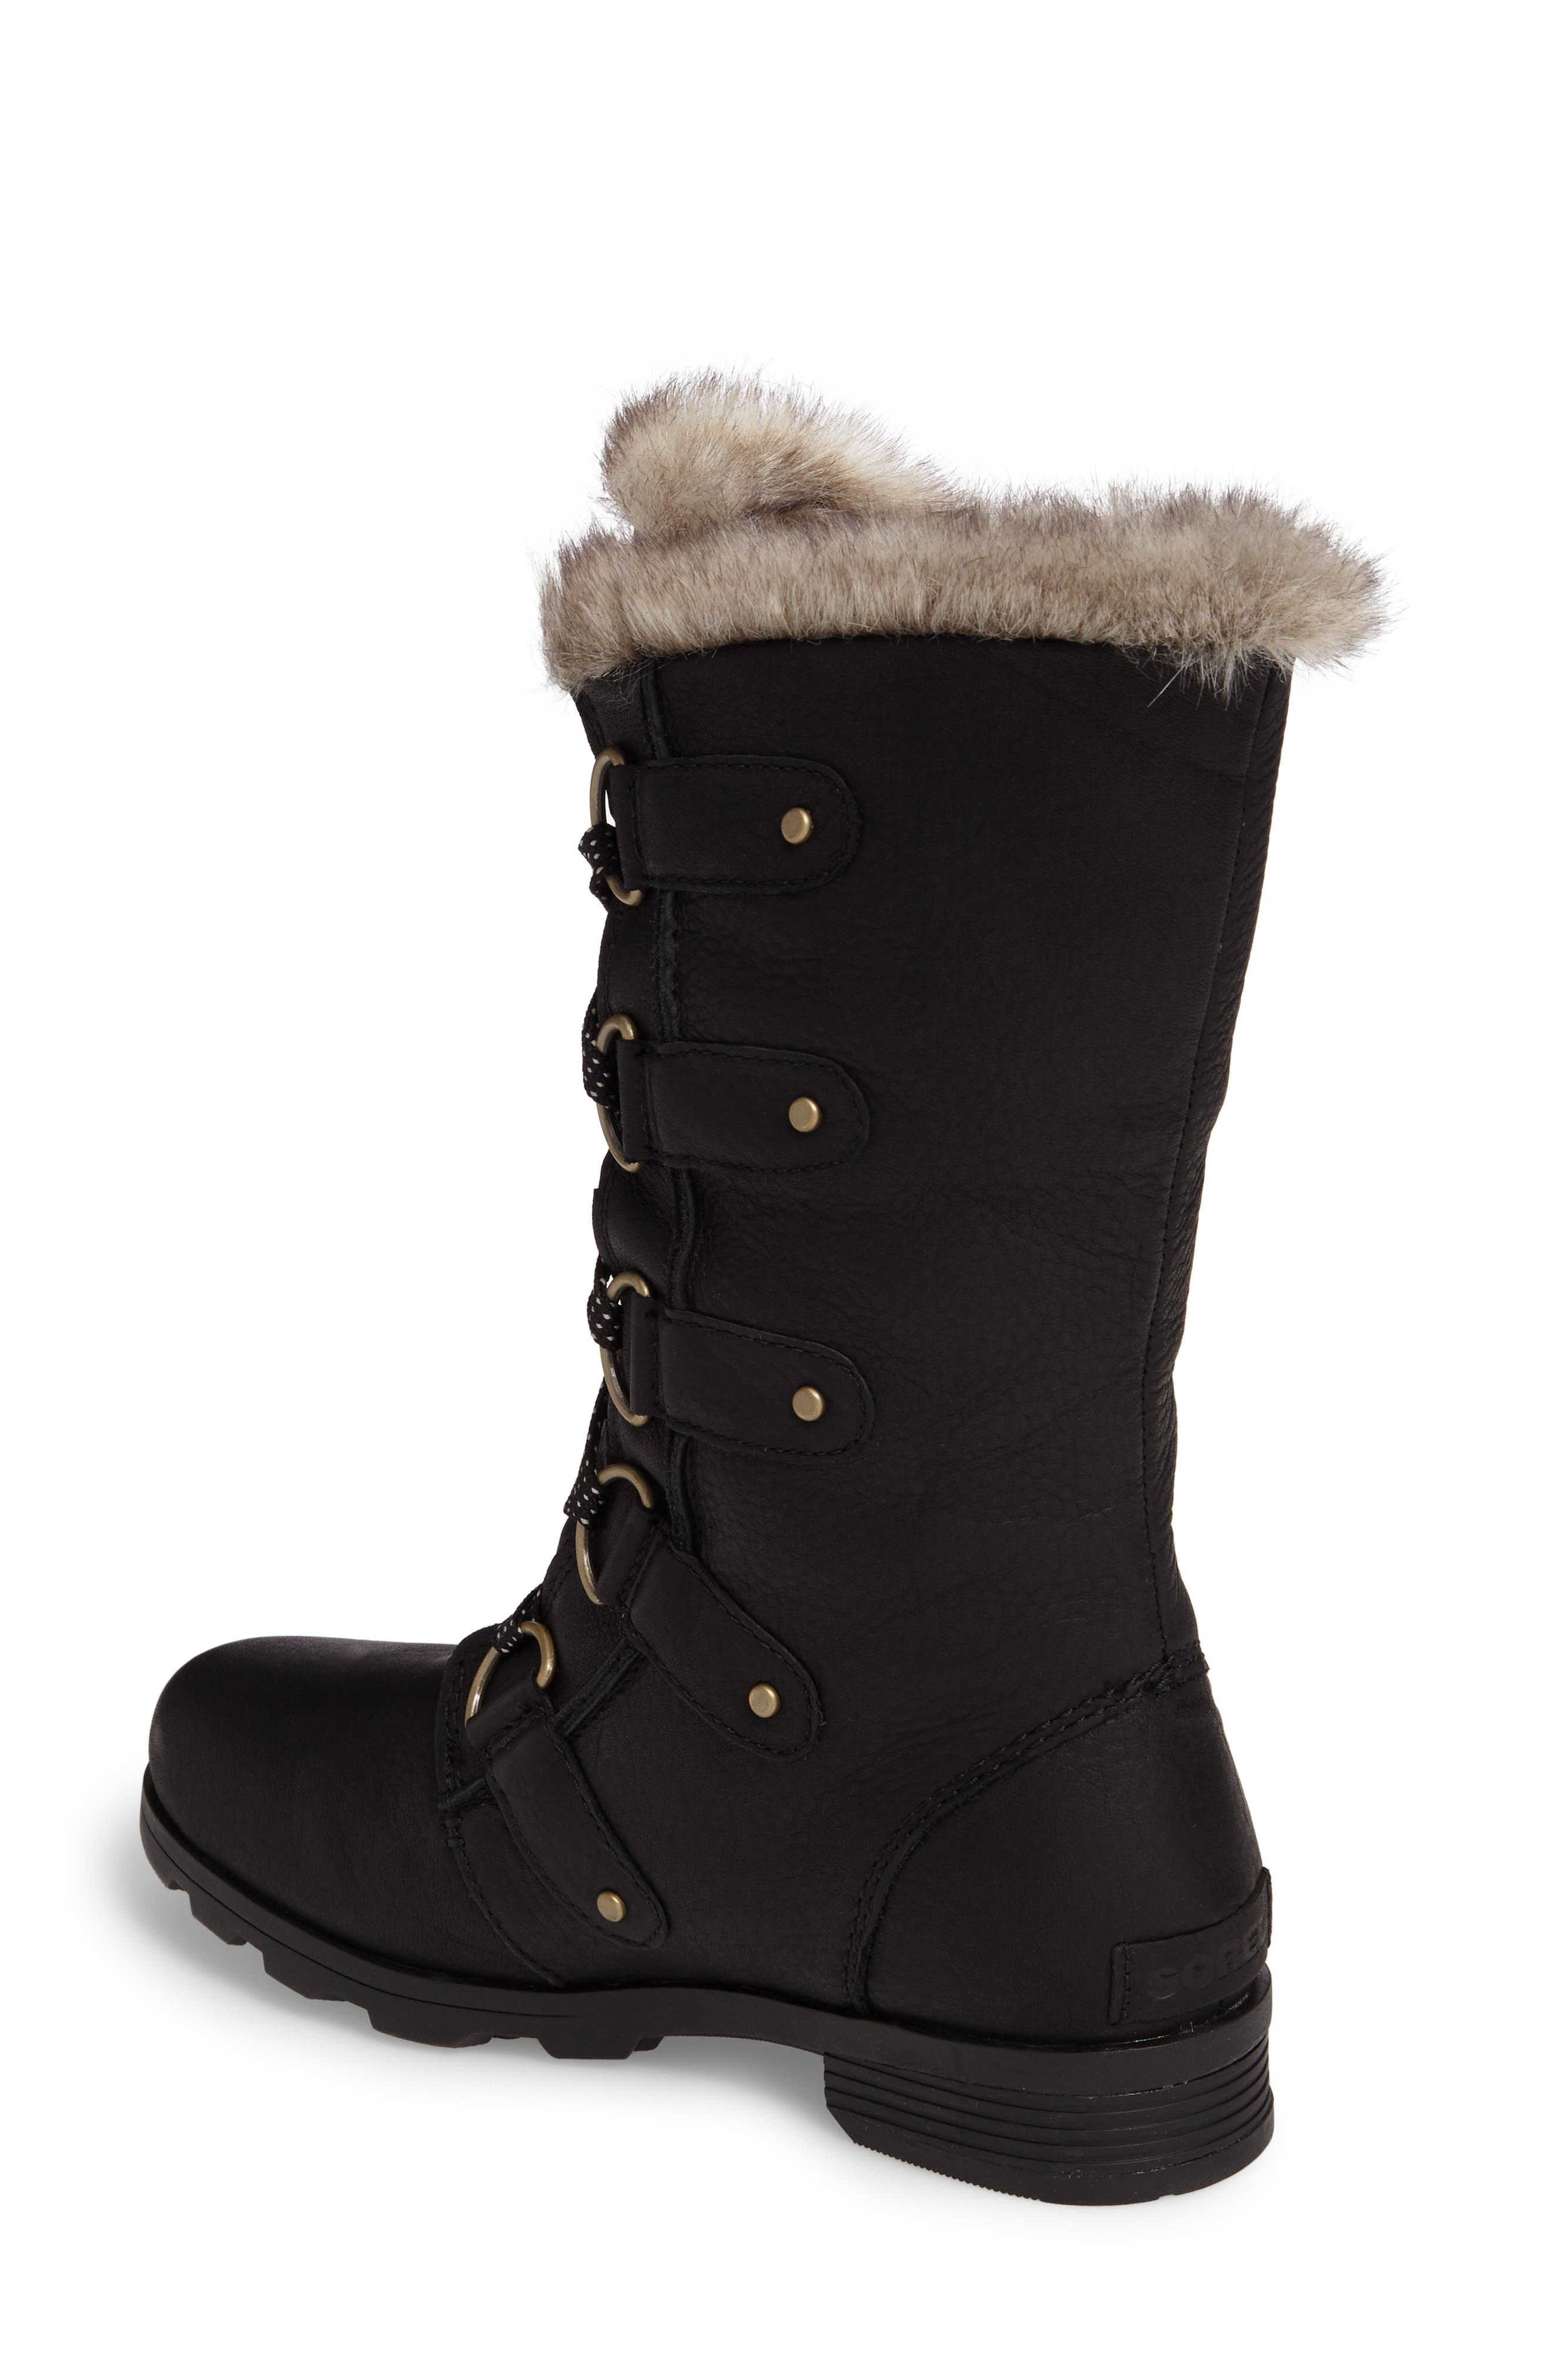 Emelie Waterproof Lace Up Boot with Faux Fur Trim,                             Alternate thumbnail 2, color,                             Black